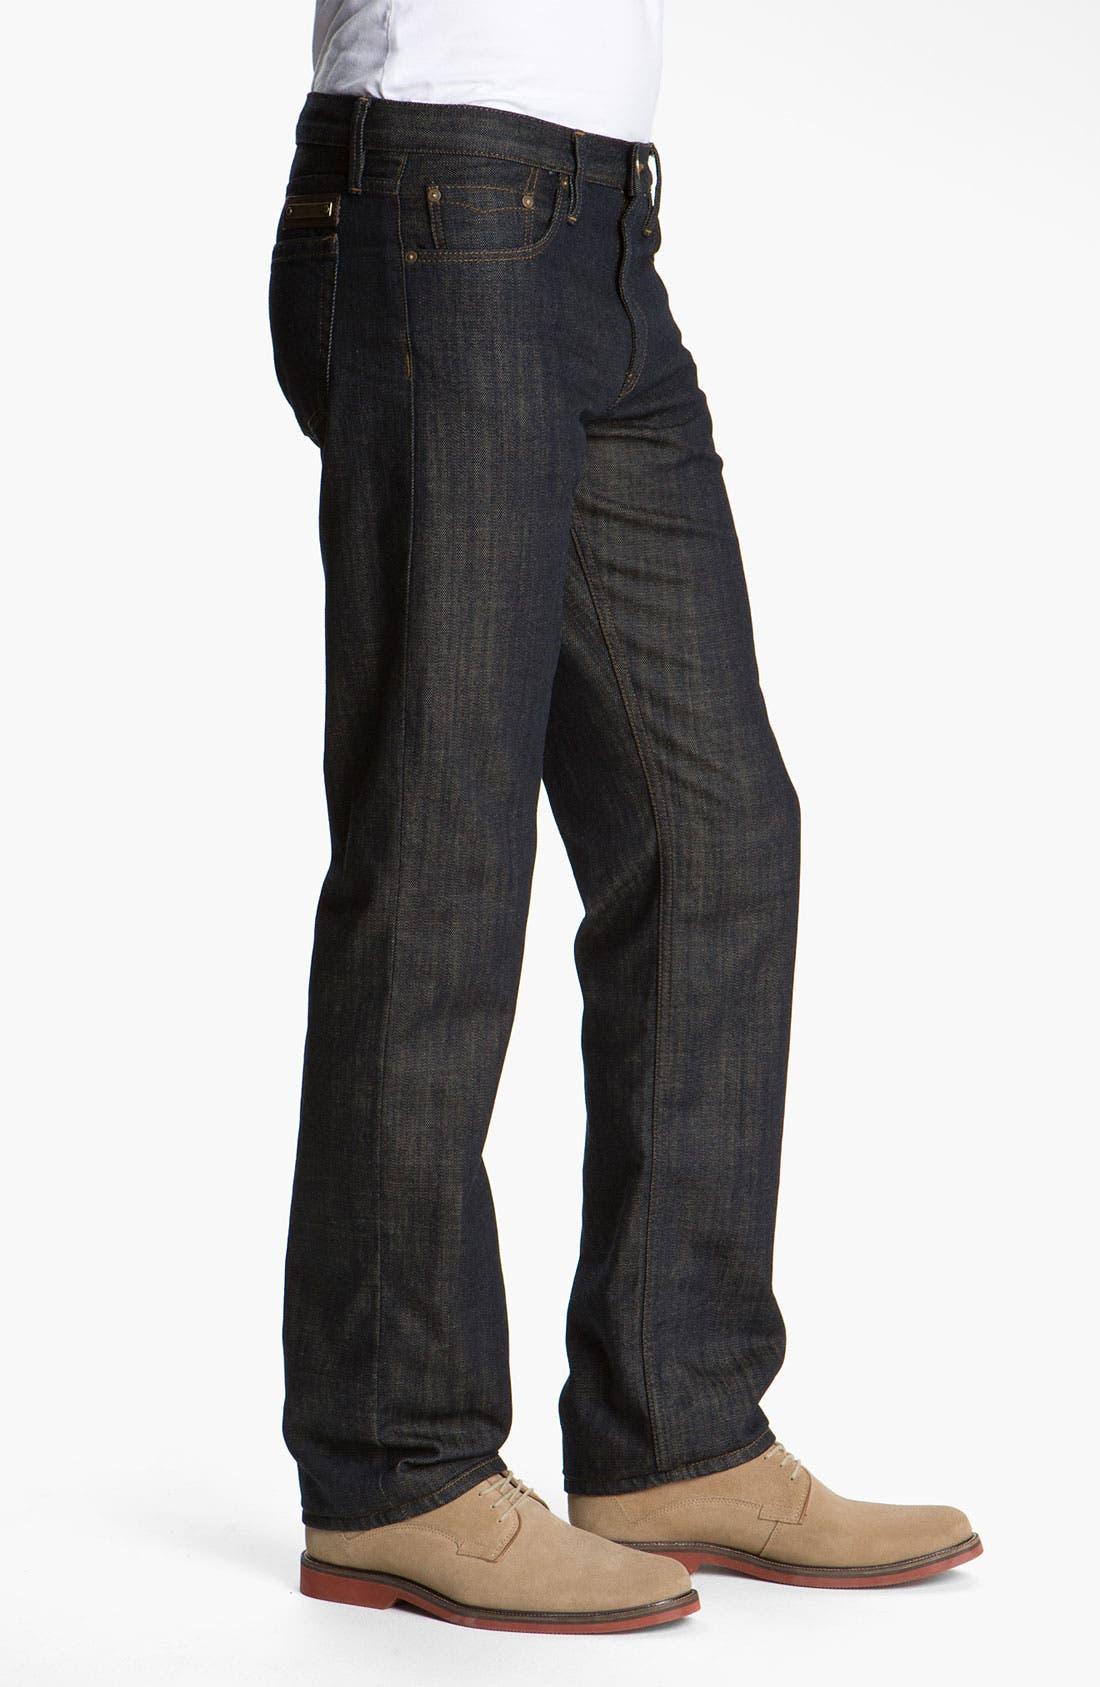 Alternate Image 3  - Burberry Brit 'Cavendish' Resin Washed Denim Jeans (Indigo Blue)